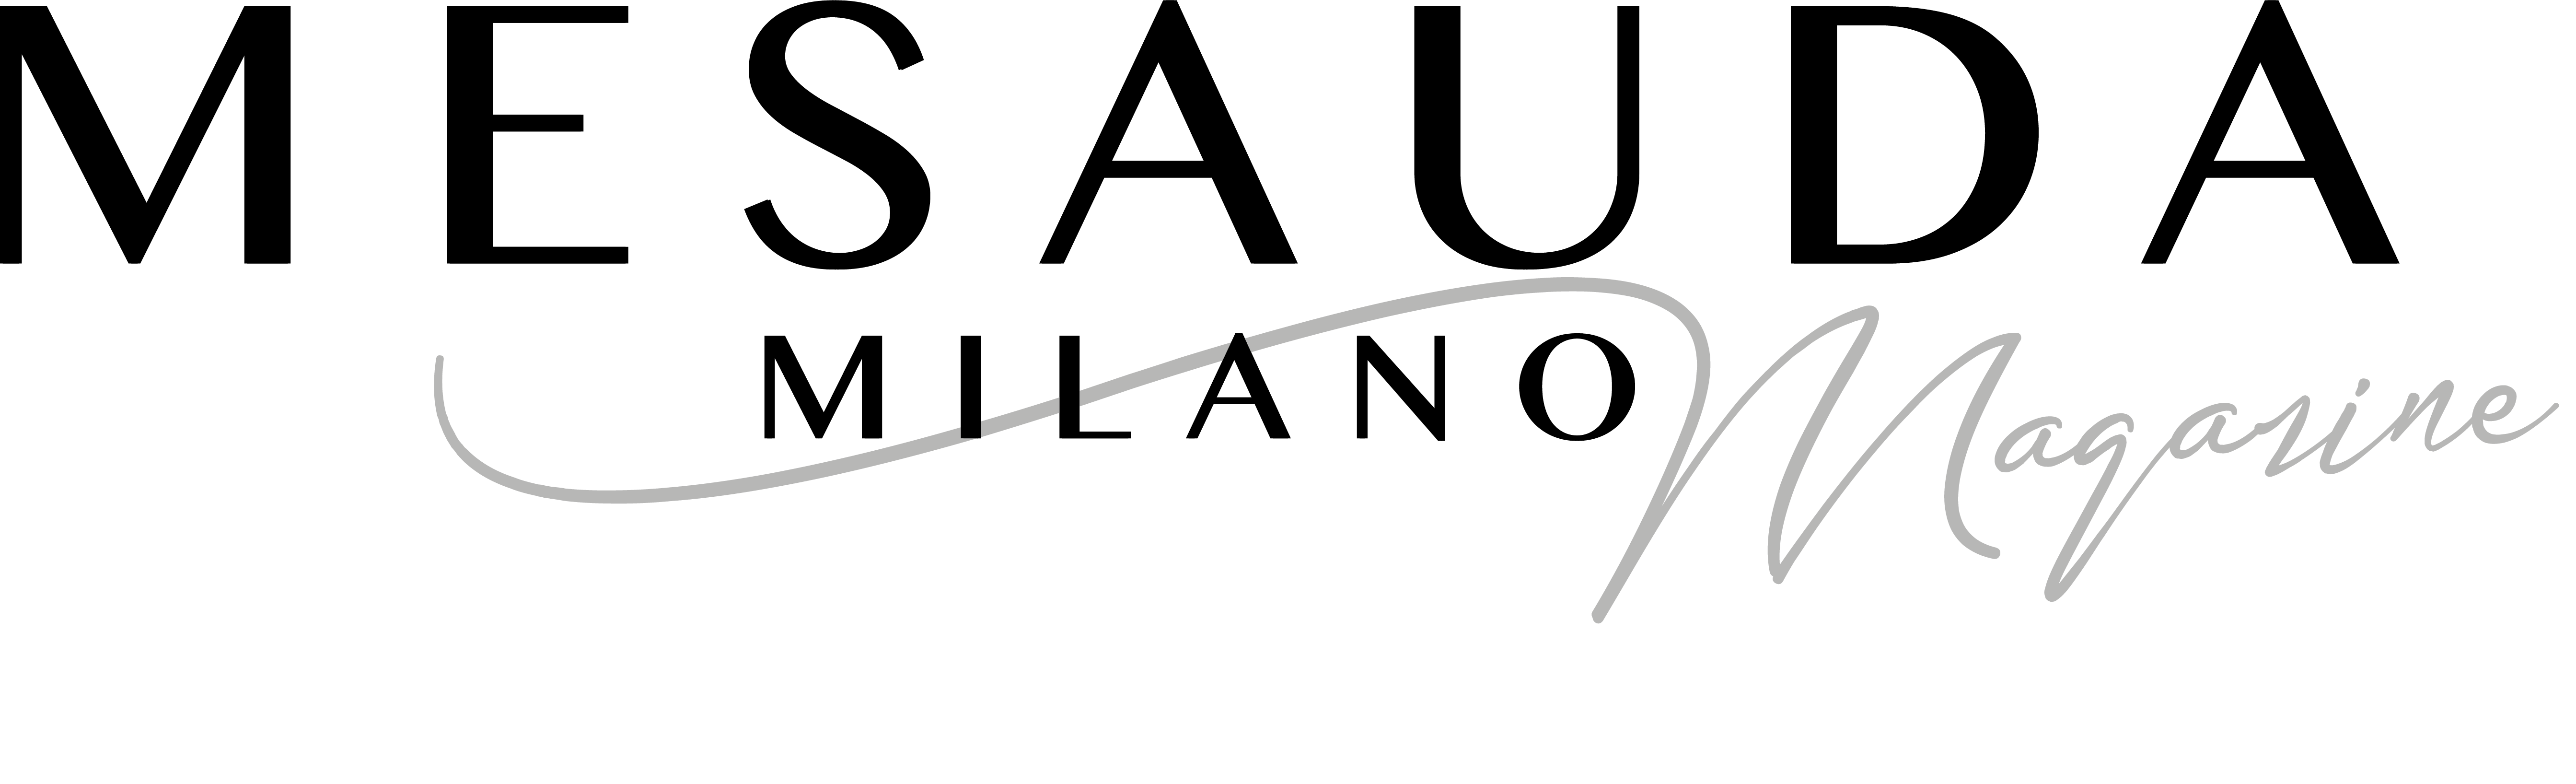 Mesauda Milano Magazine logo